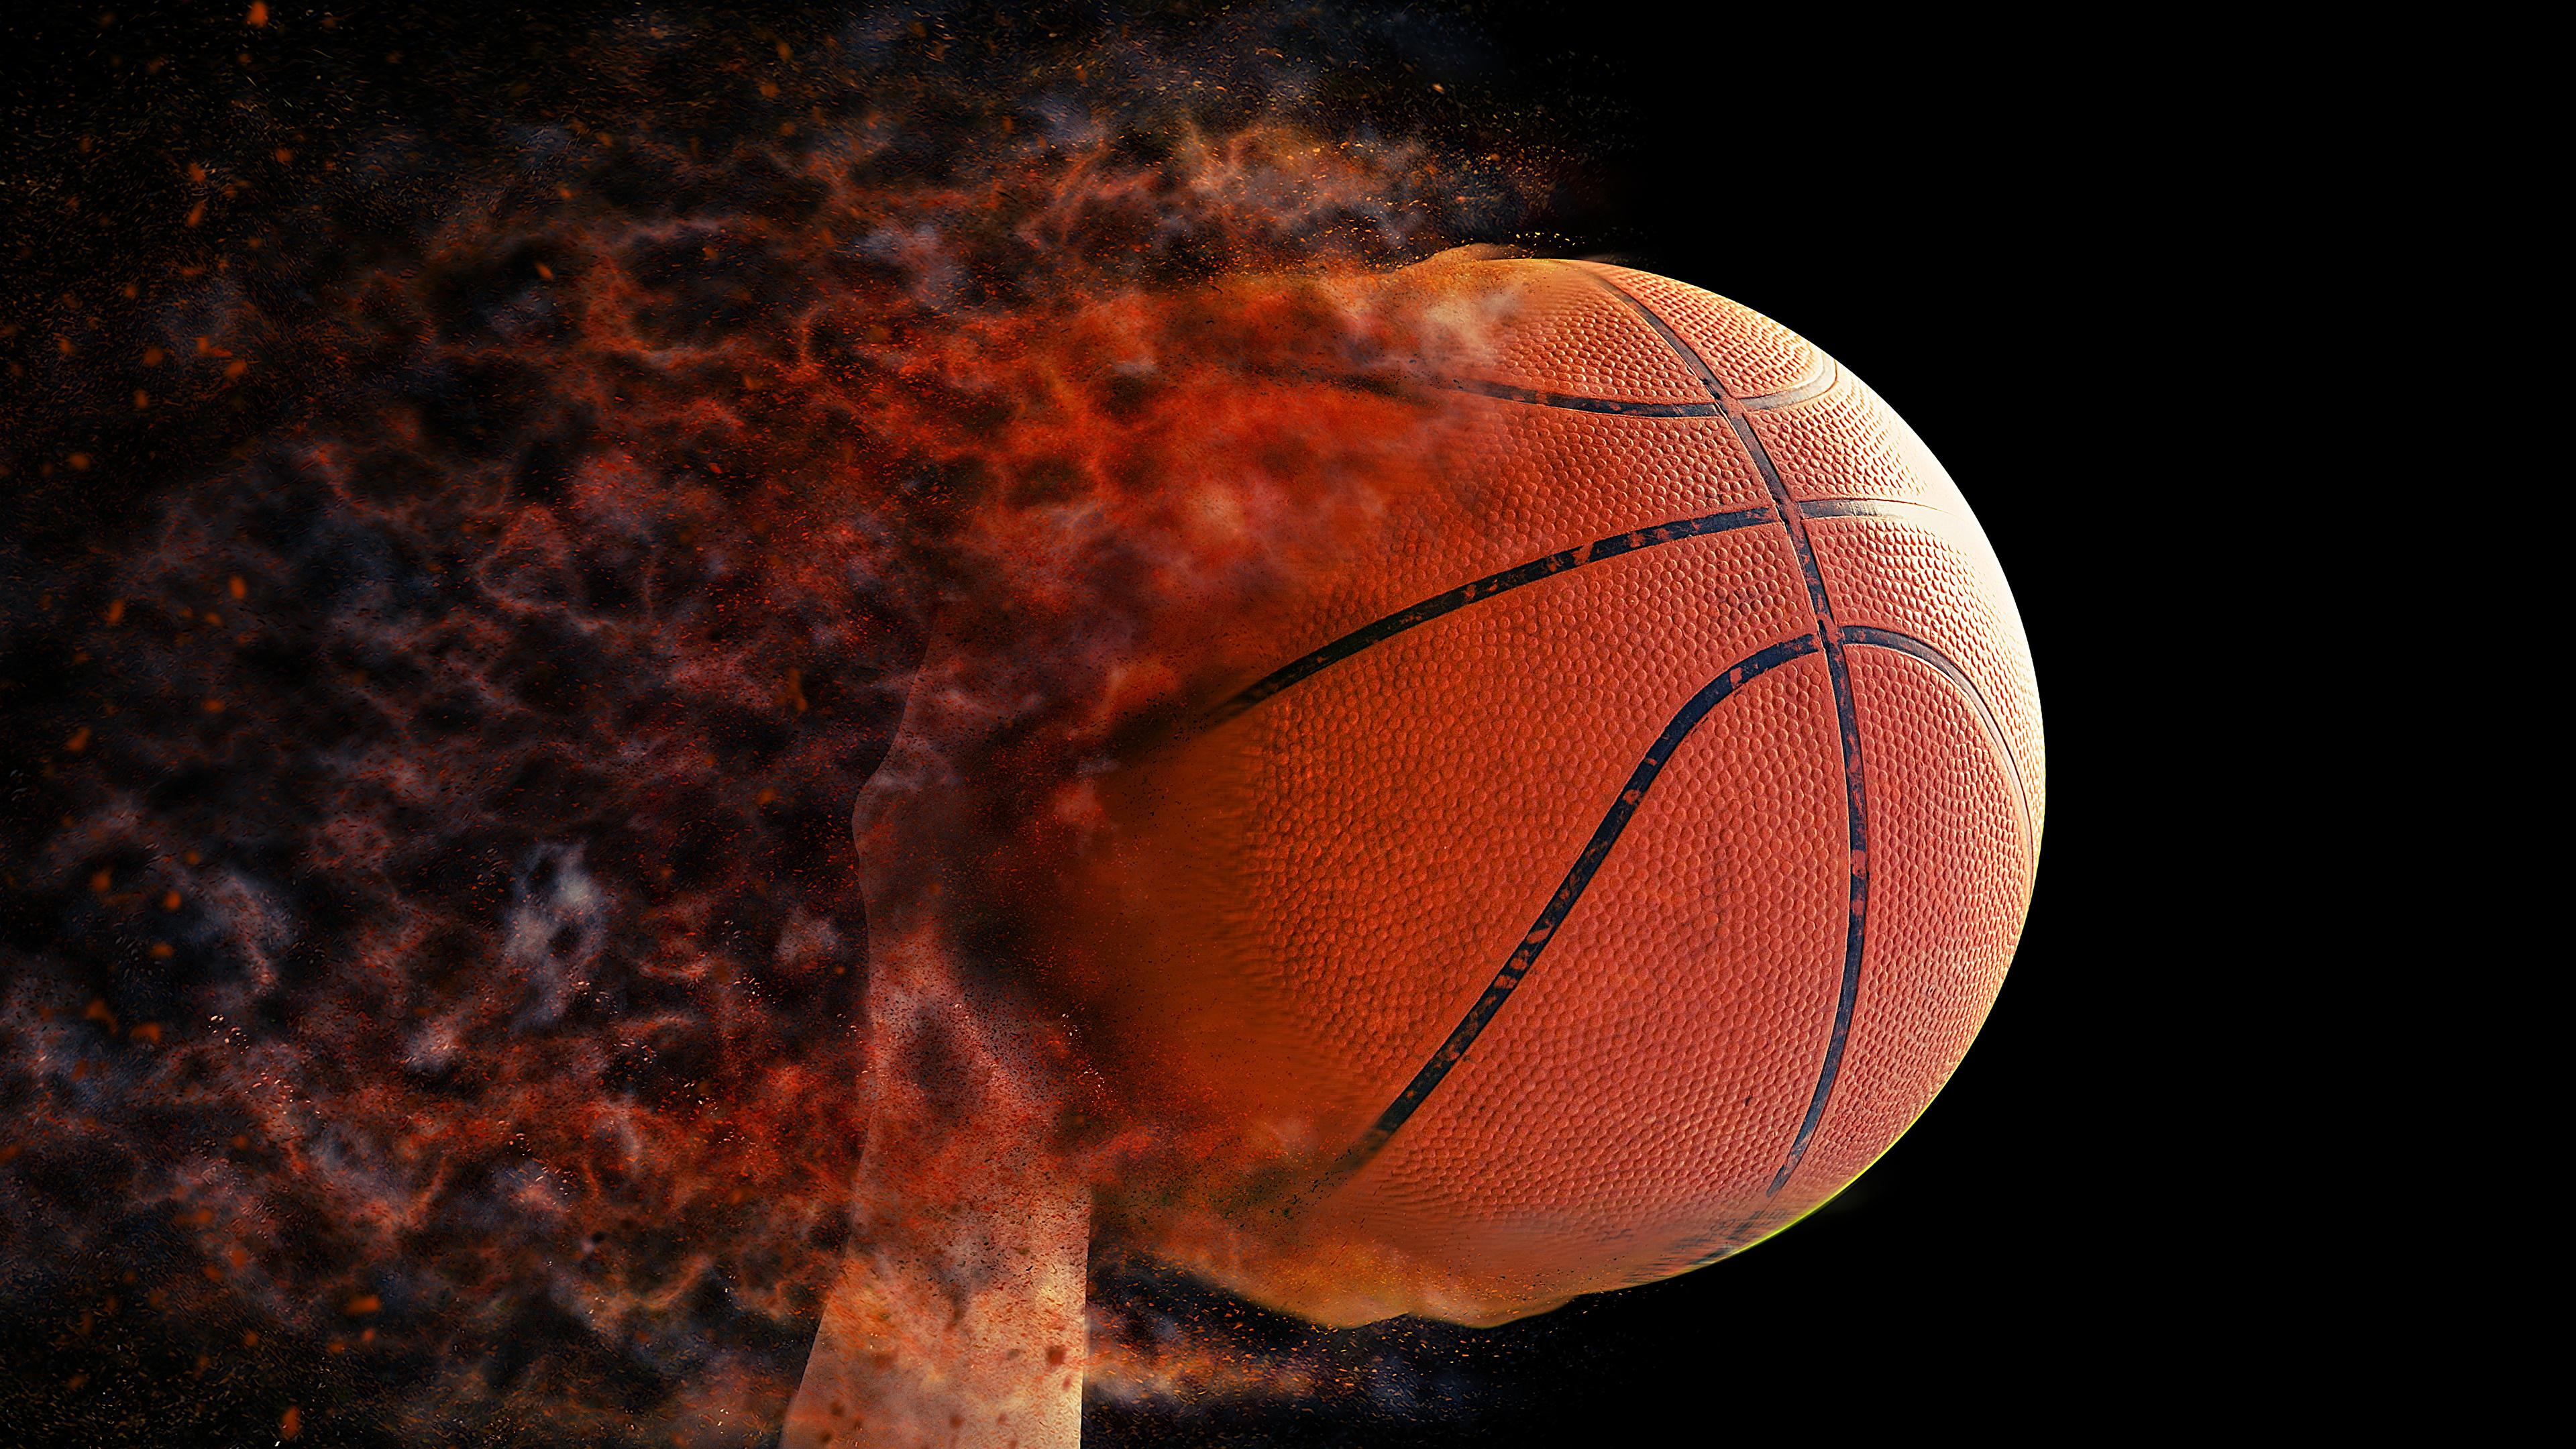 Wallpaper Sport Basketball Flame Ball Black Background 3840x2160